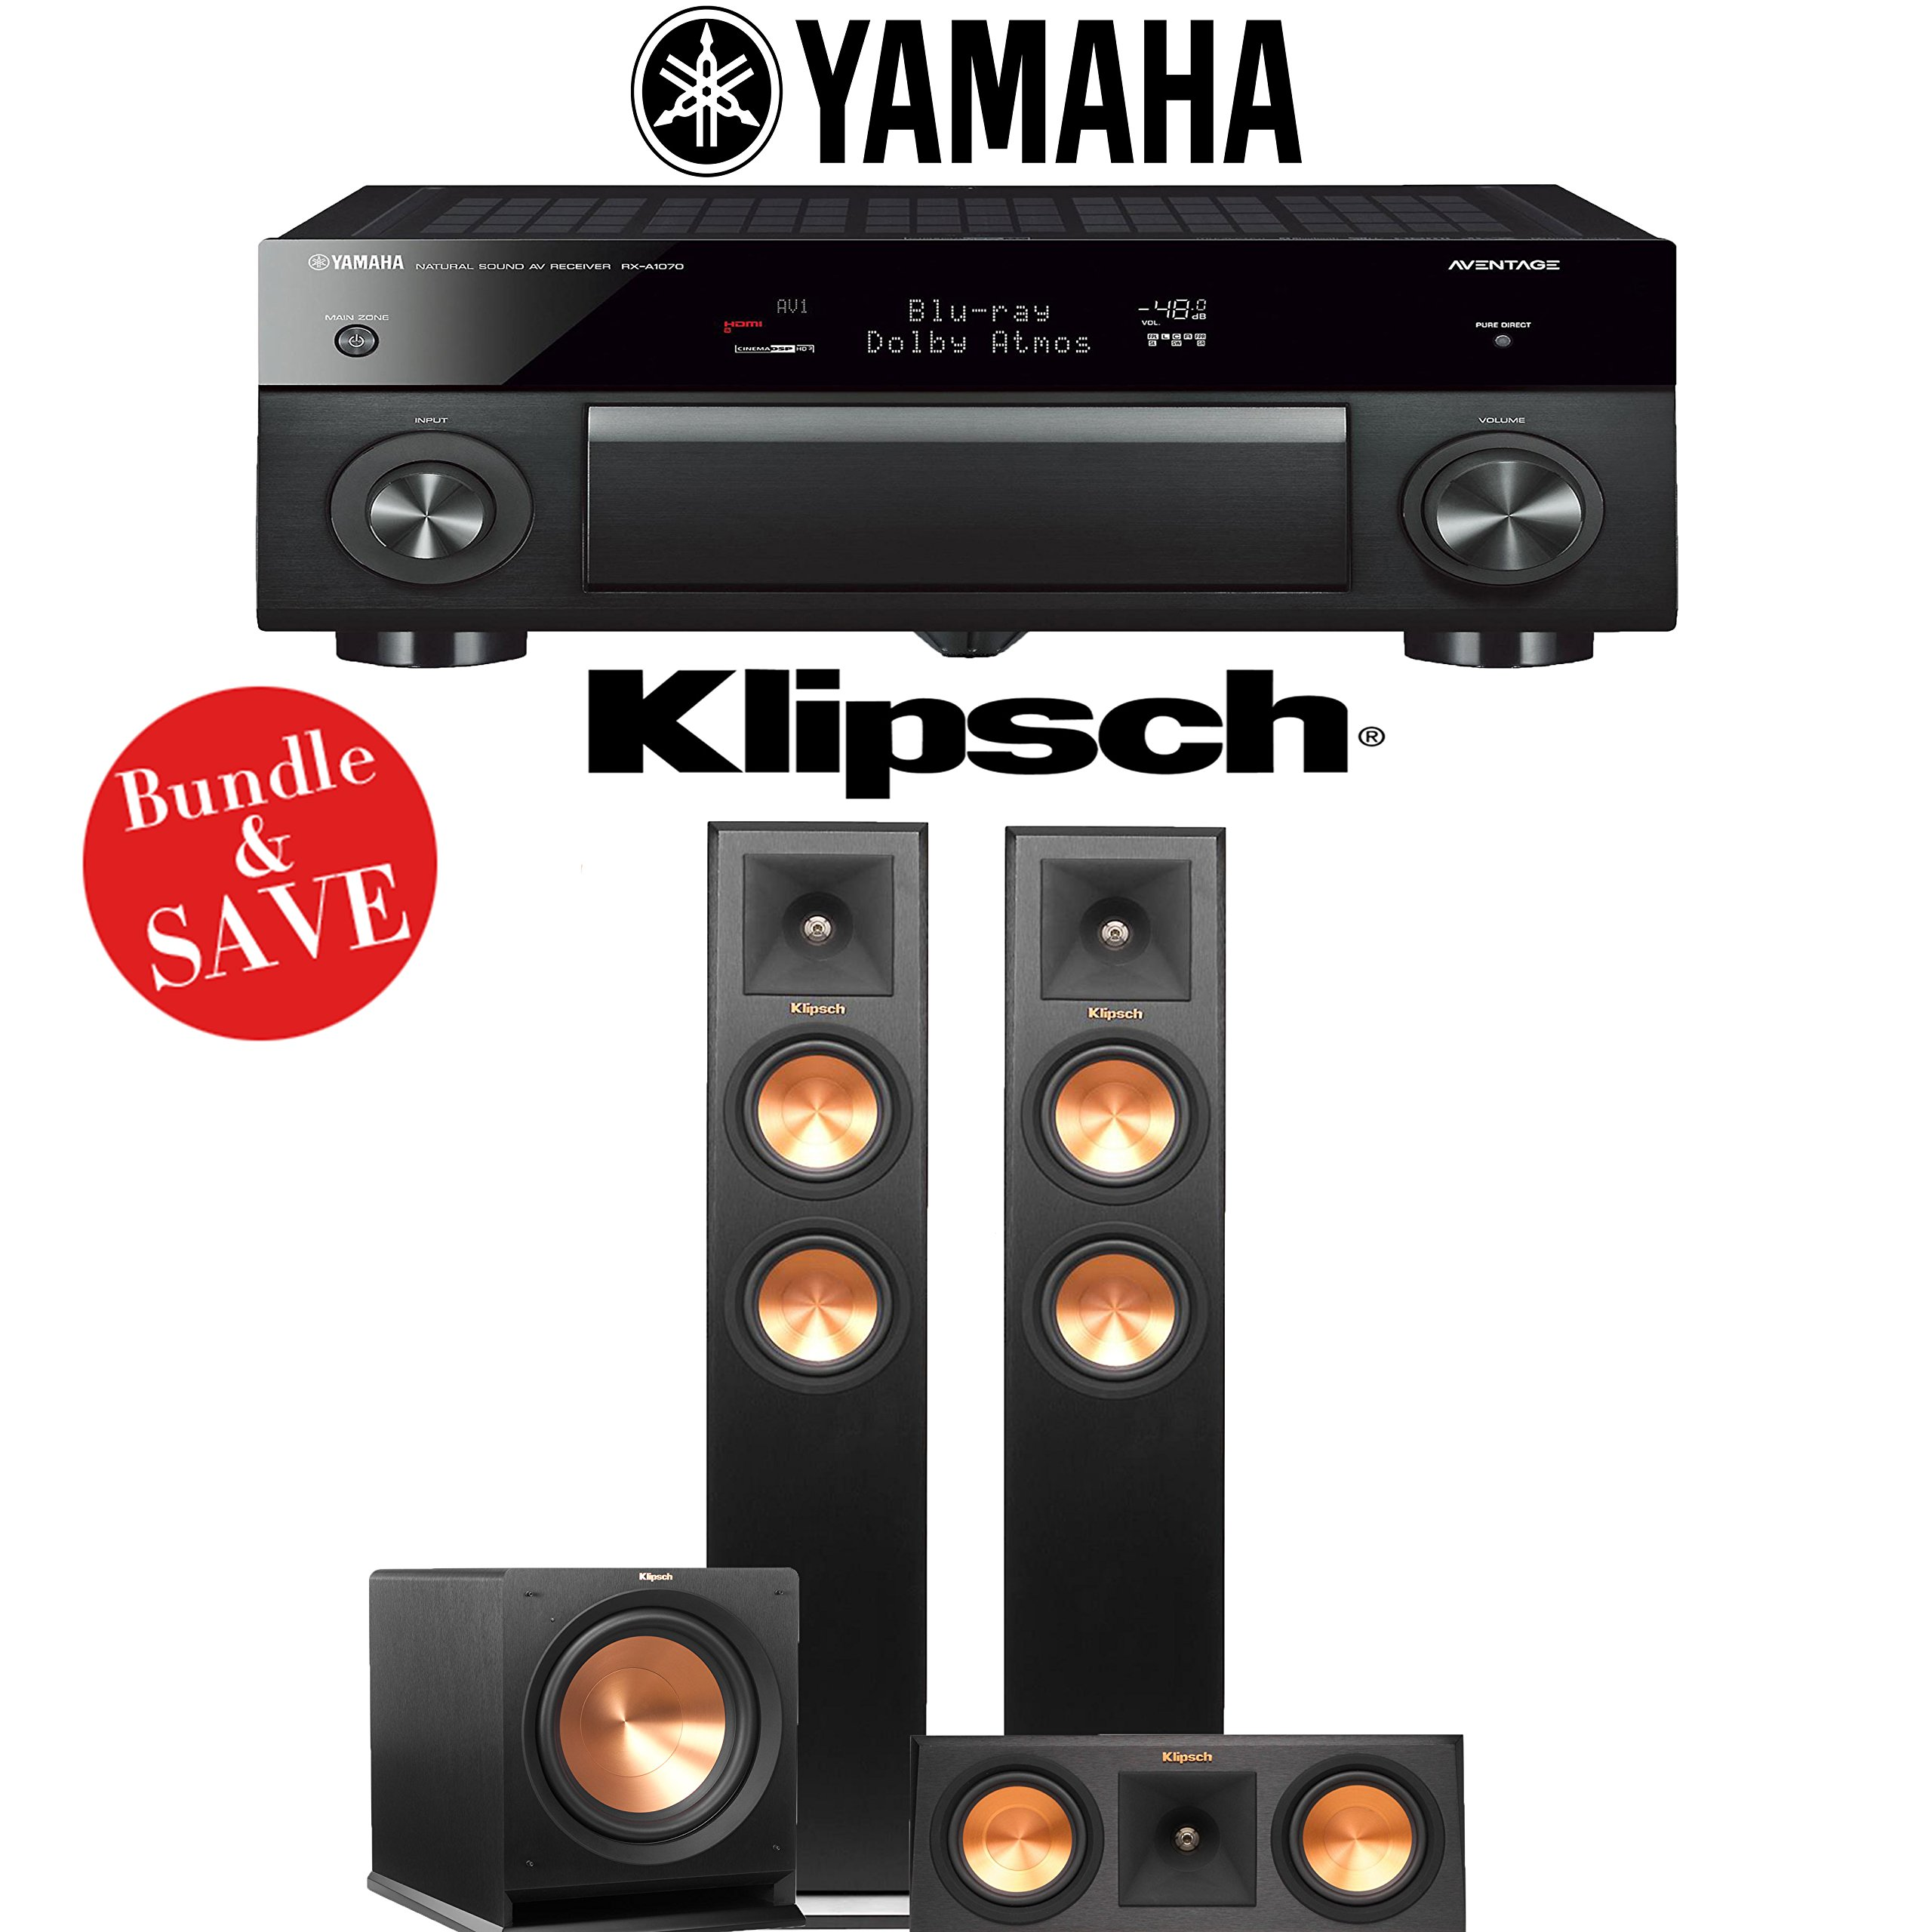 Yamaha AVENTAGE RX-A1070BL 7.2-Ch 4K Network AV Receiver + Klipsch RP-250F + Klipsch RP-250C + Klipsch R-112SW - 3.1-Ch Home Theater Package by Yamaha